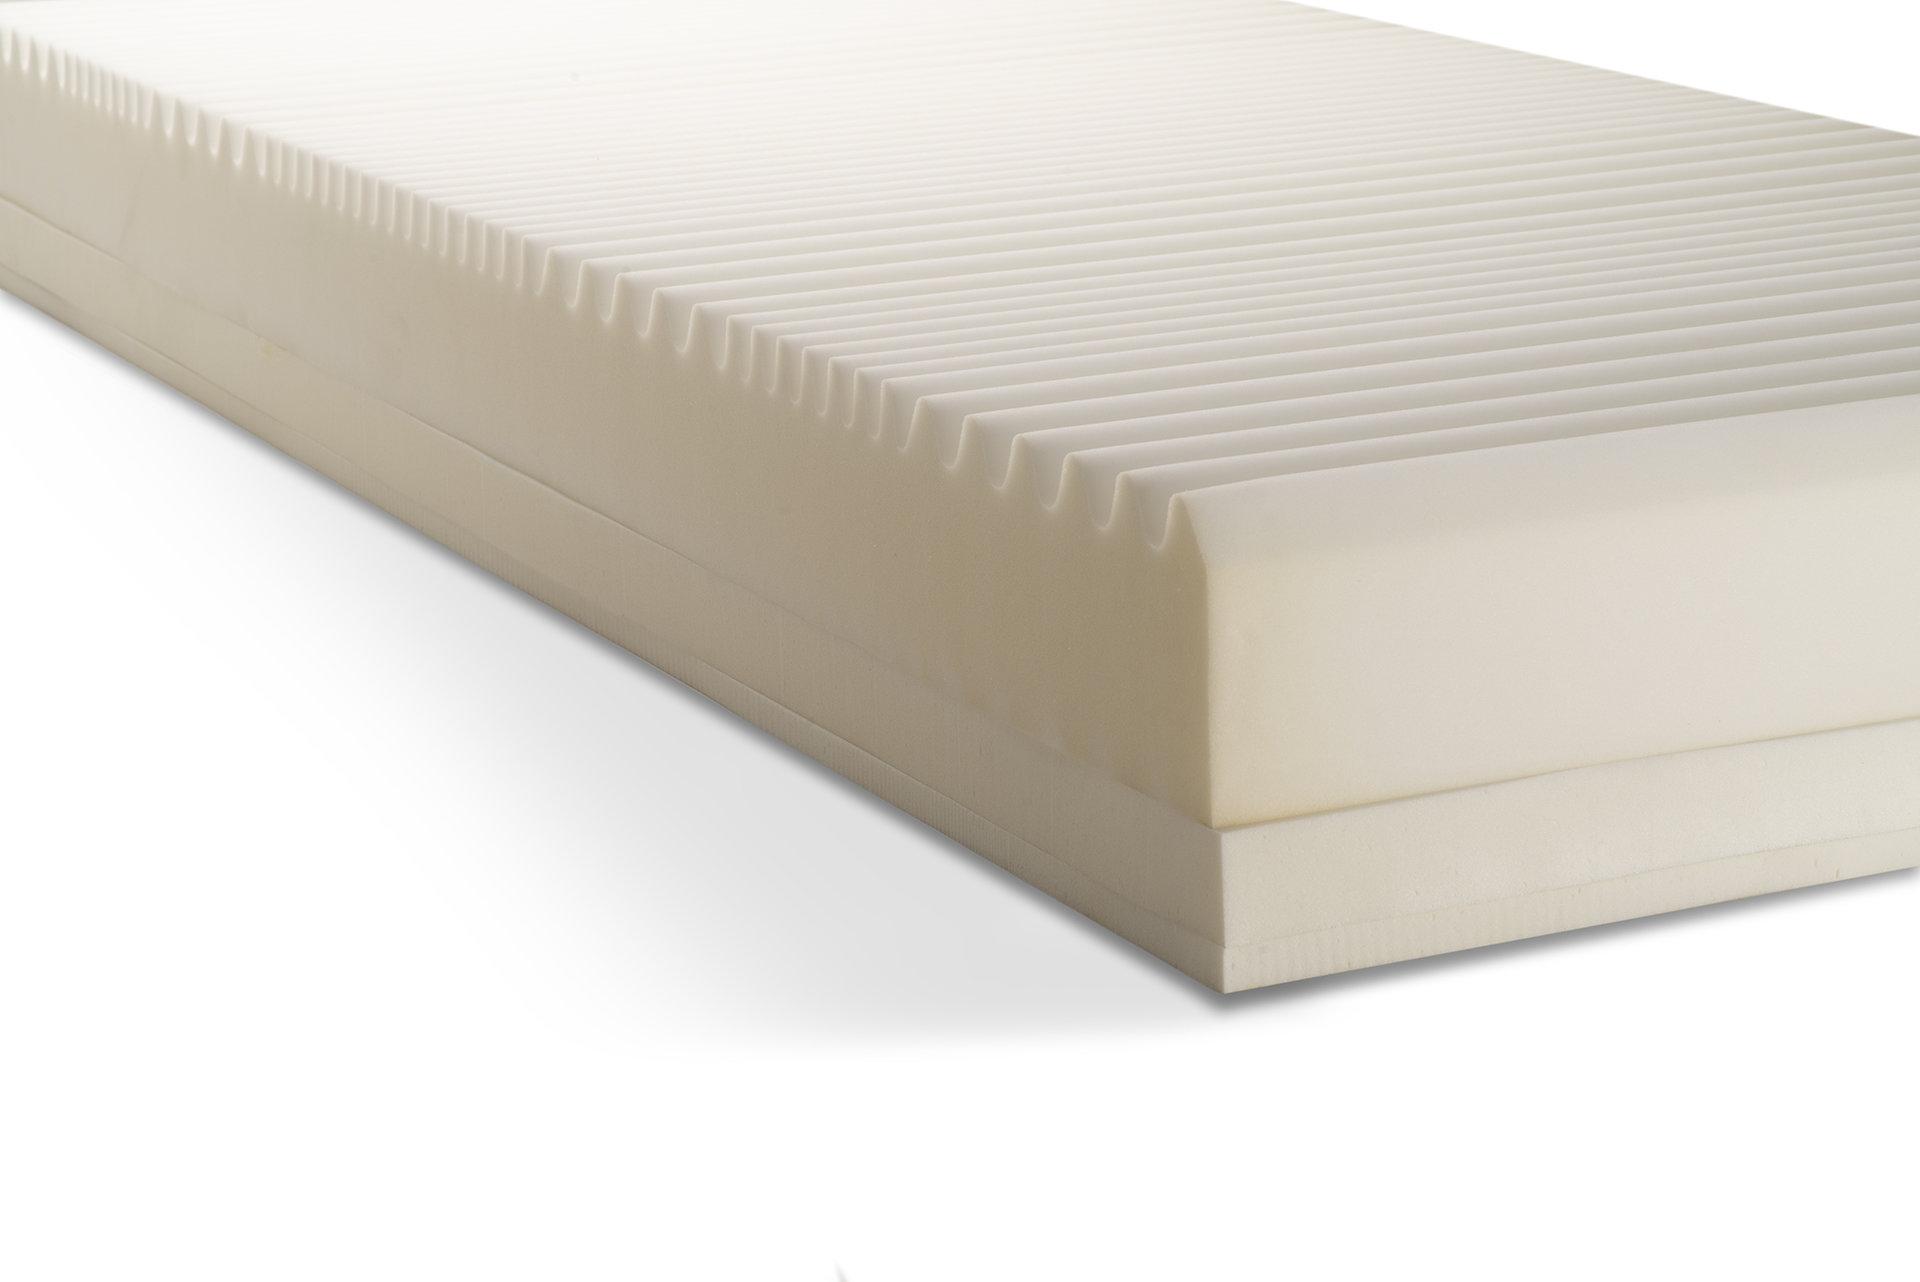 Bamboo 7 - 20 см, двулицев 7 зонов мемори матрак